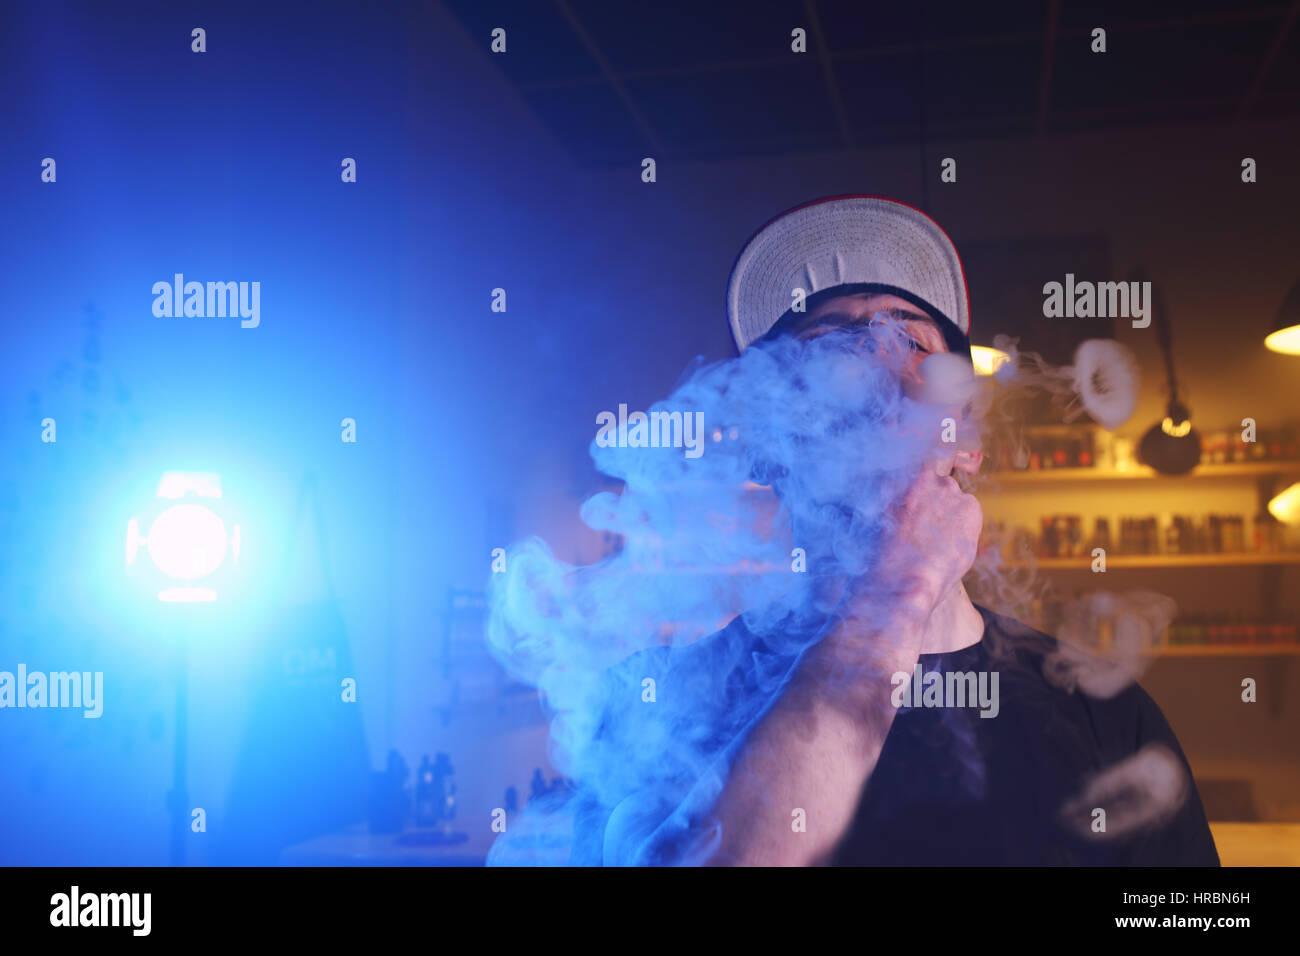 Vape. Vaping man in a cloud of vapor. Photo is taken in a vape bar. - Stock Image